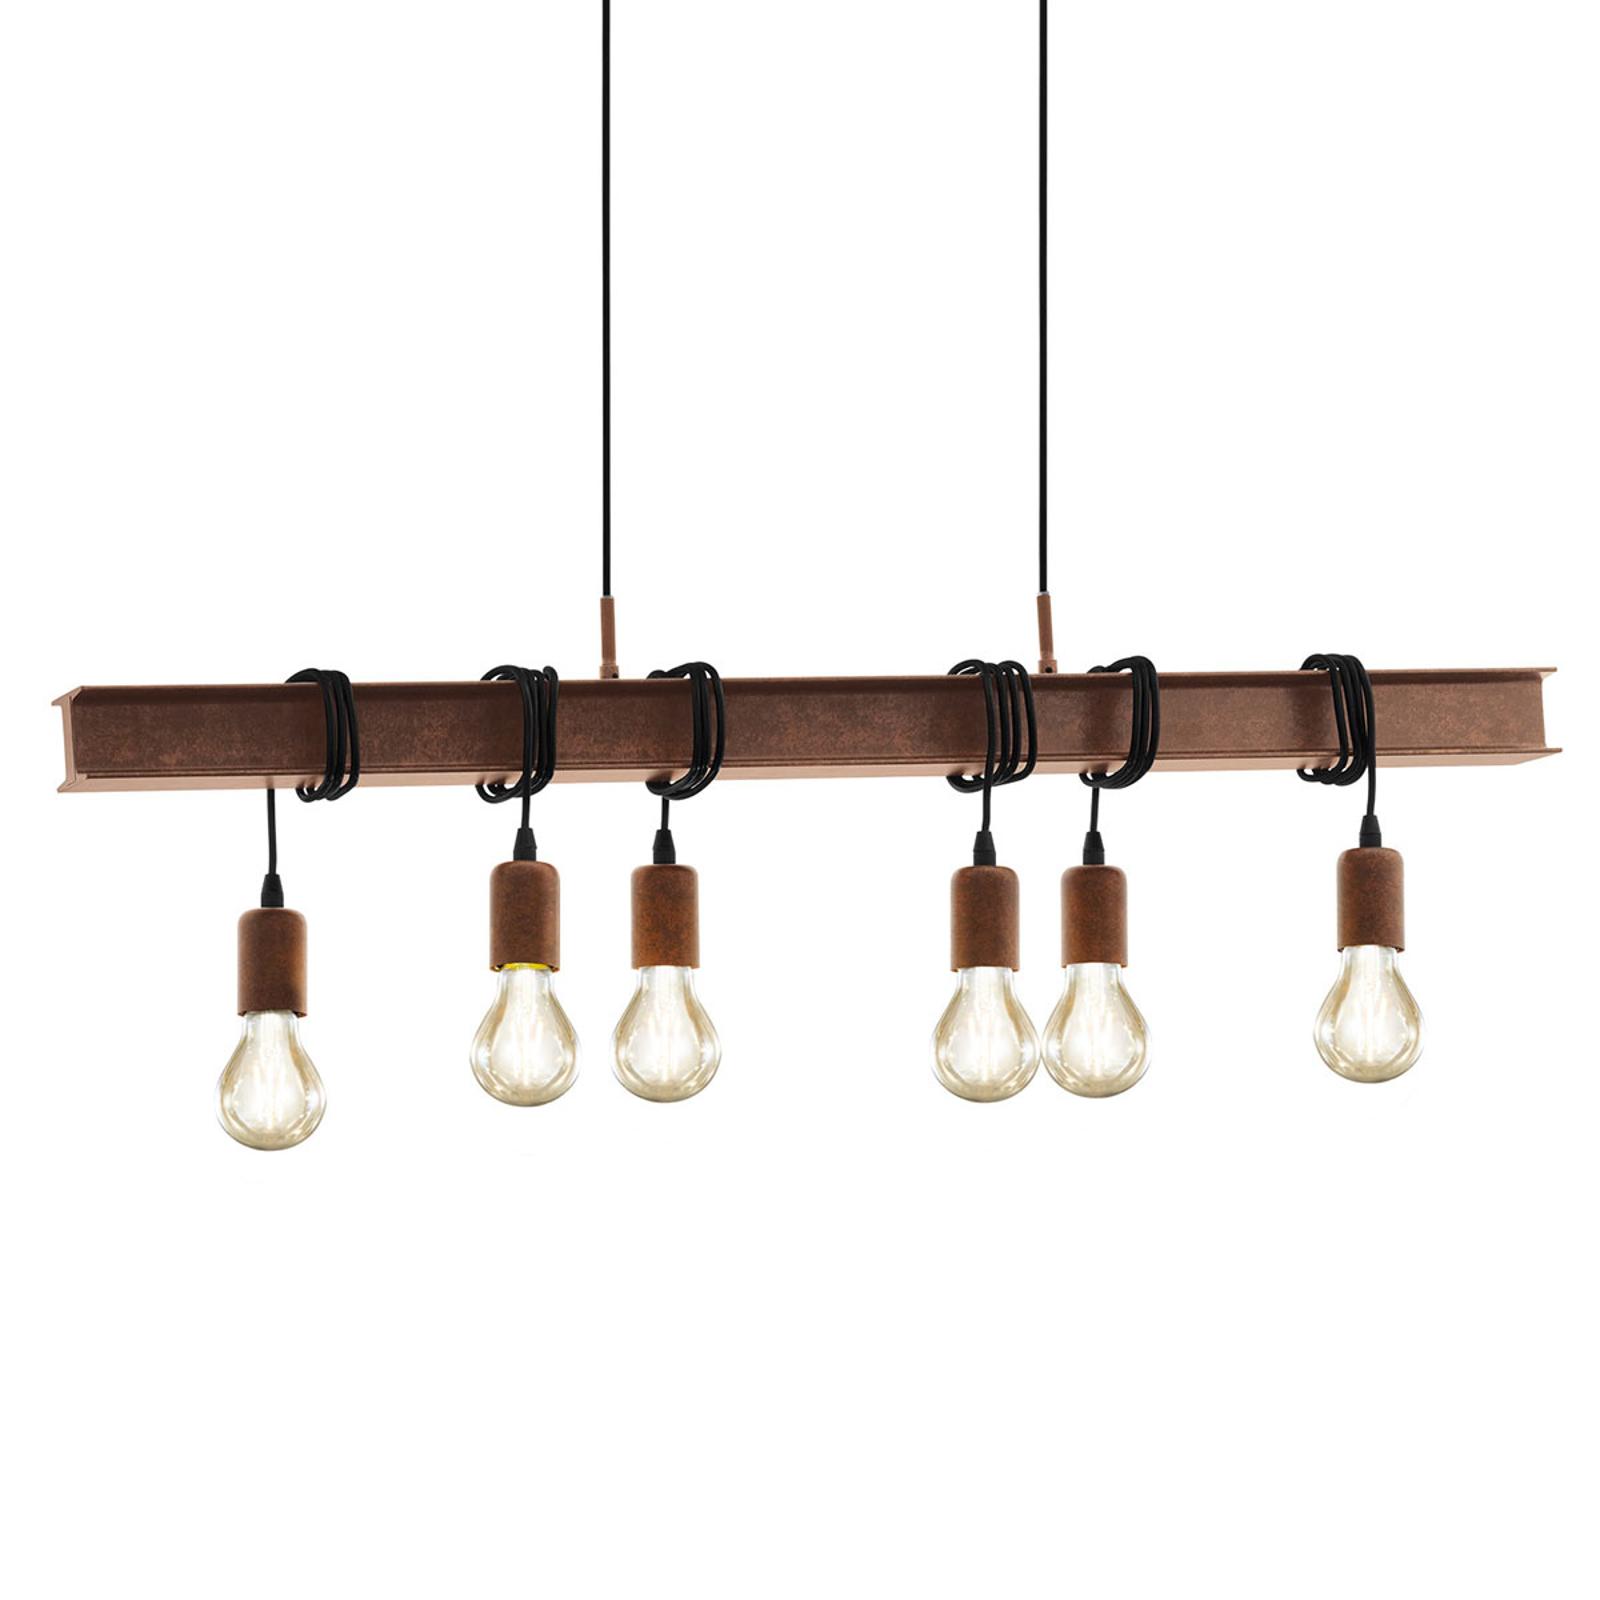 Hanglamp Townshend 4 in donkerbruin